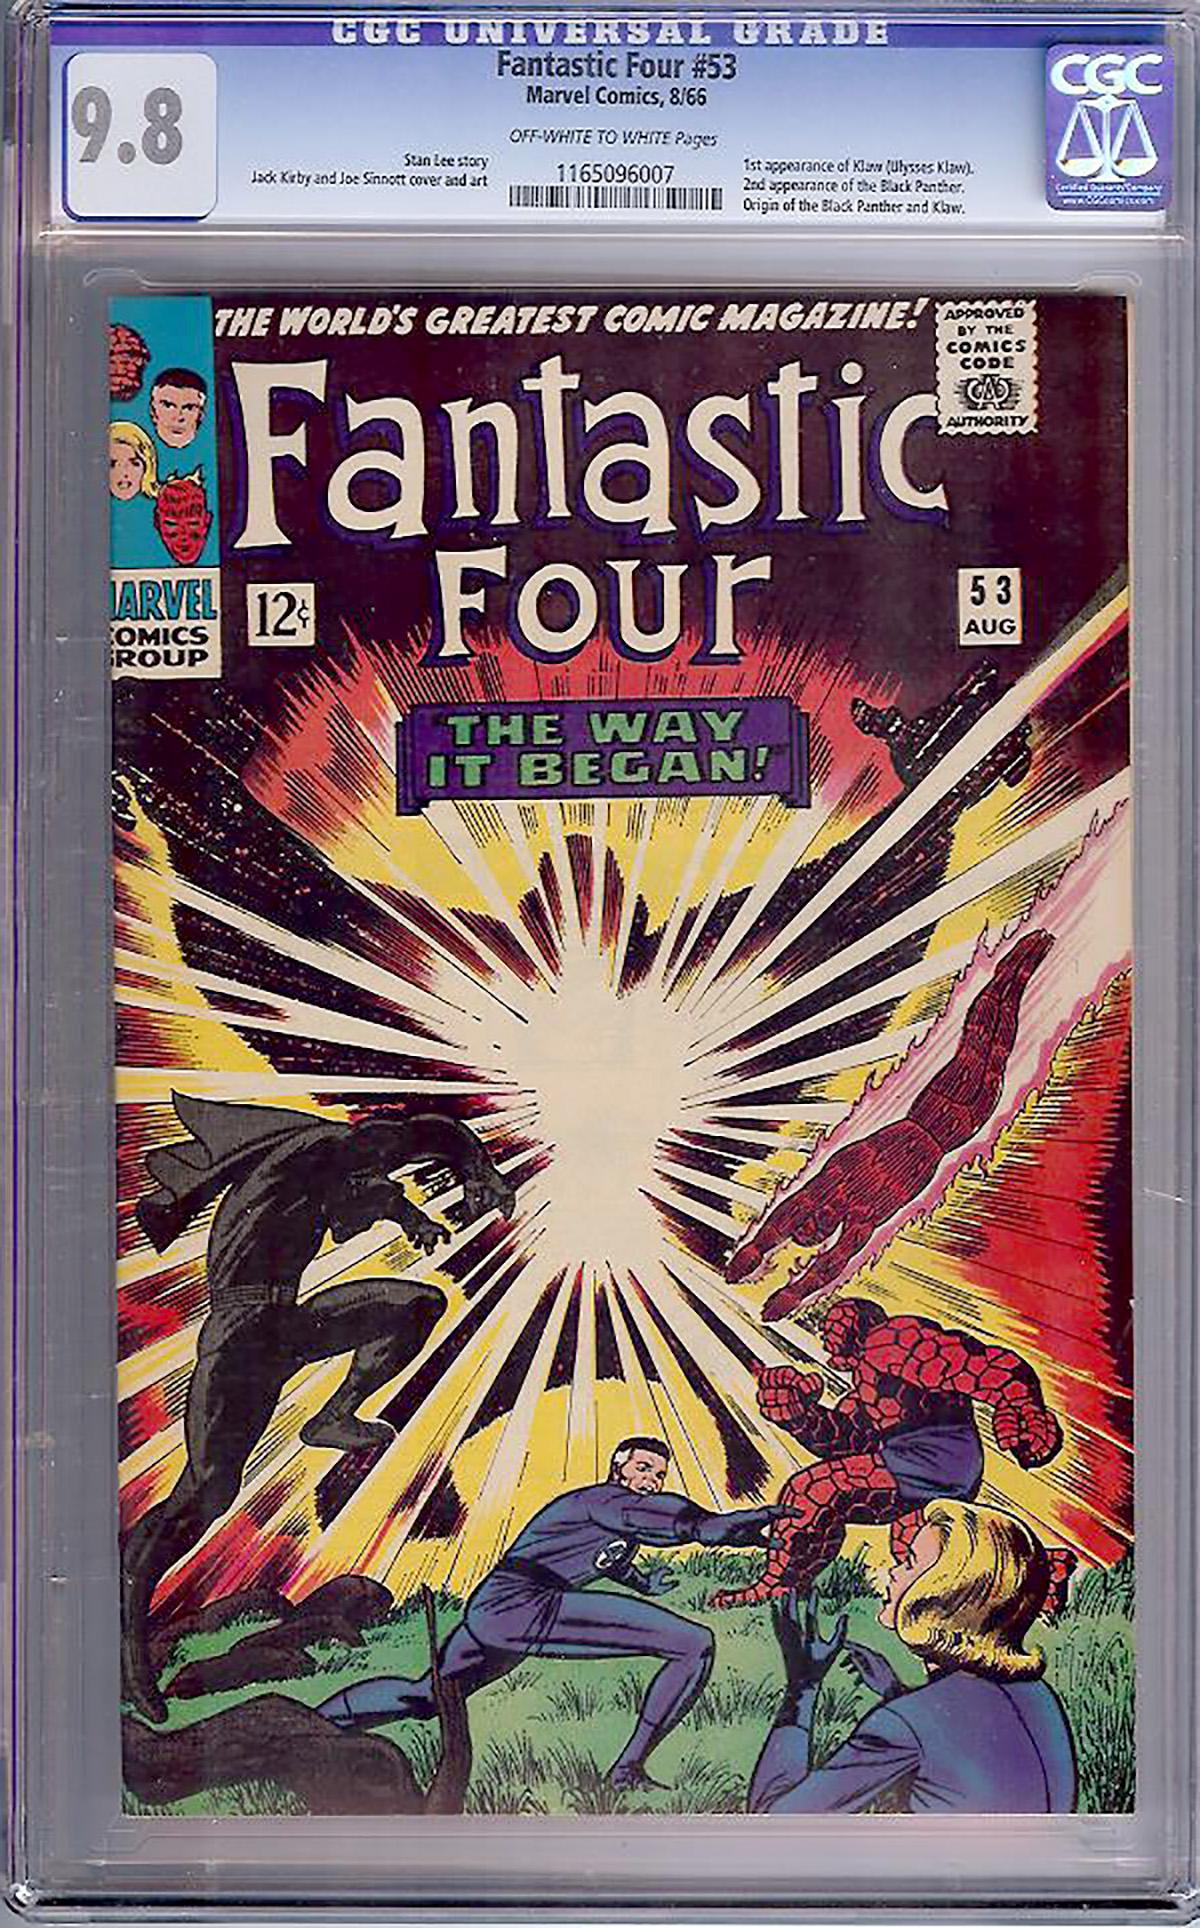 Fantastic Four #53 CGC 9.8 ow/w